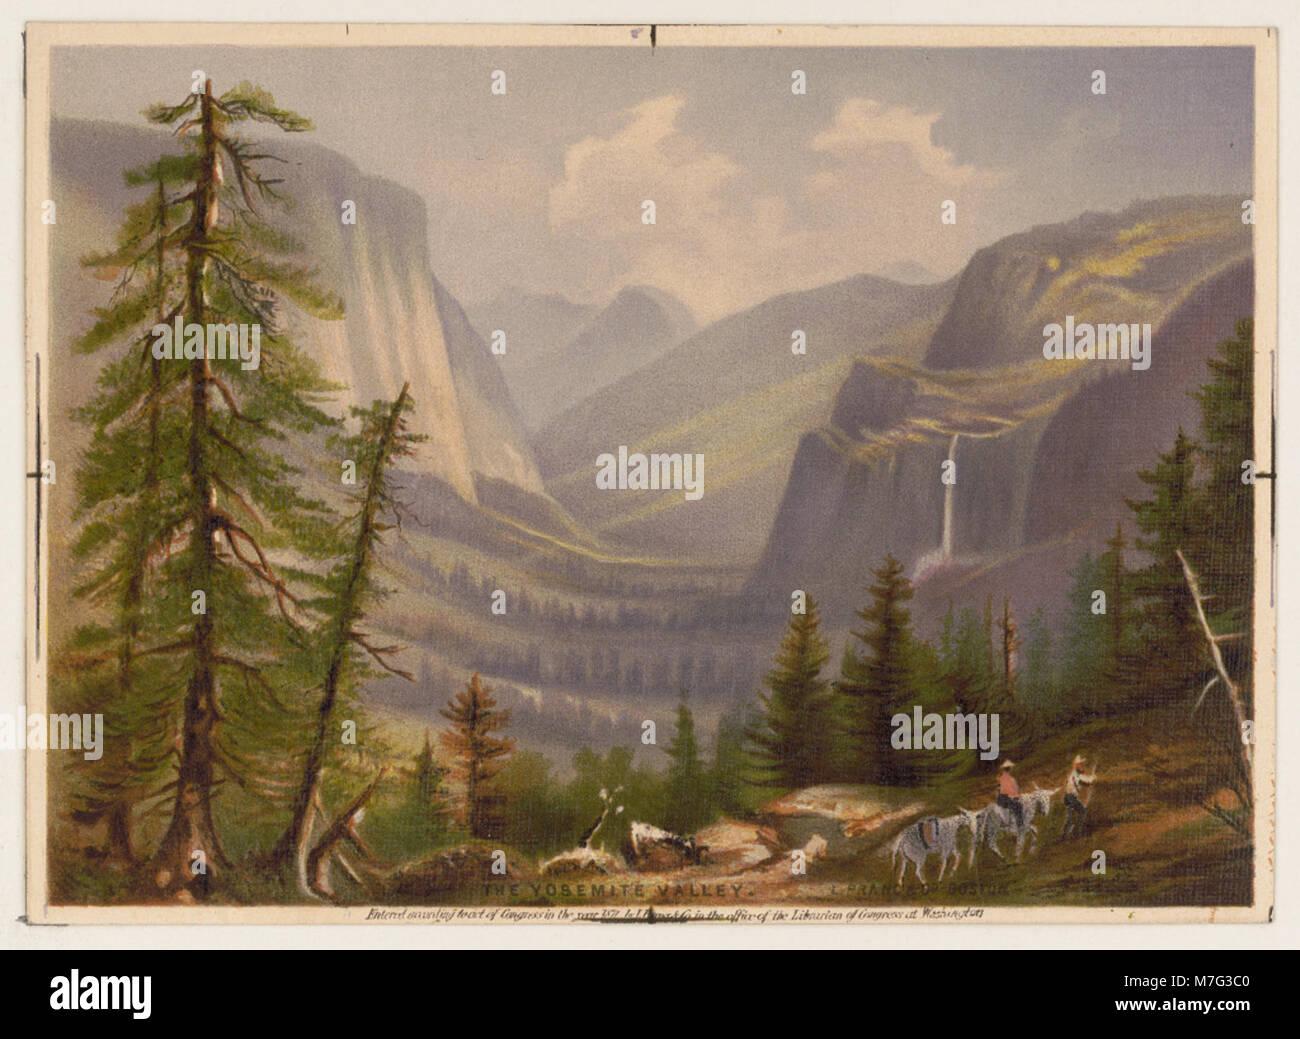 The Yosemite Valley - L. Prang & Co., Bost. LCCN94508695 - Stock Image